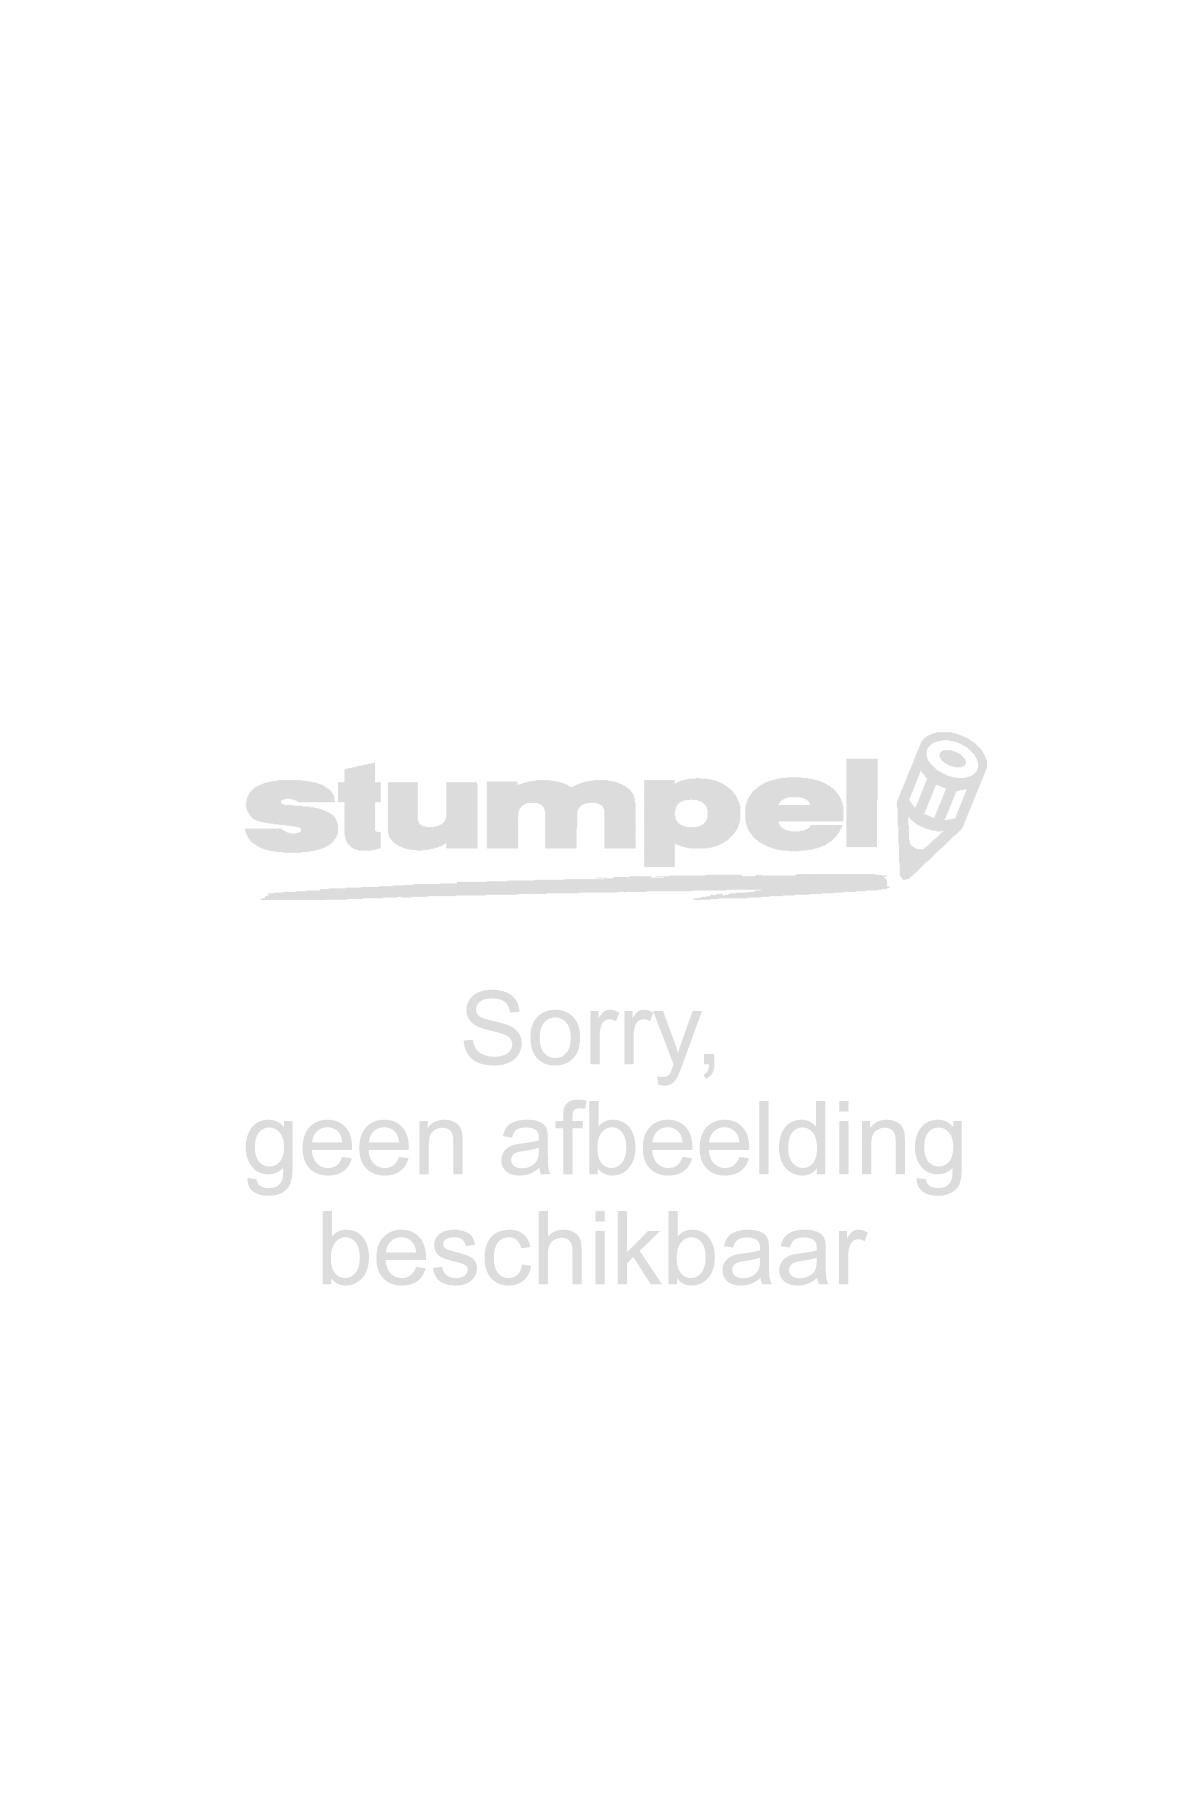 inkjetpapier-hpq-1981-3831-a4-glossy;-pkj-20vel-7030200